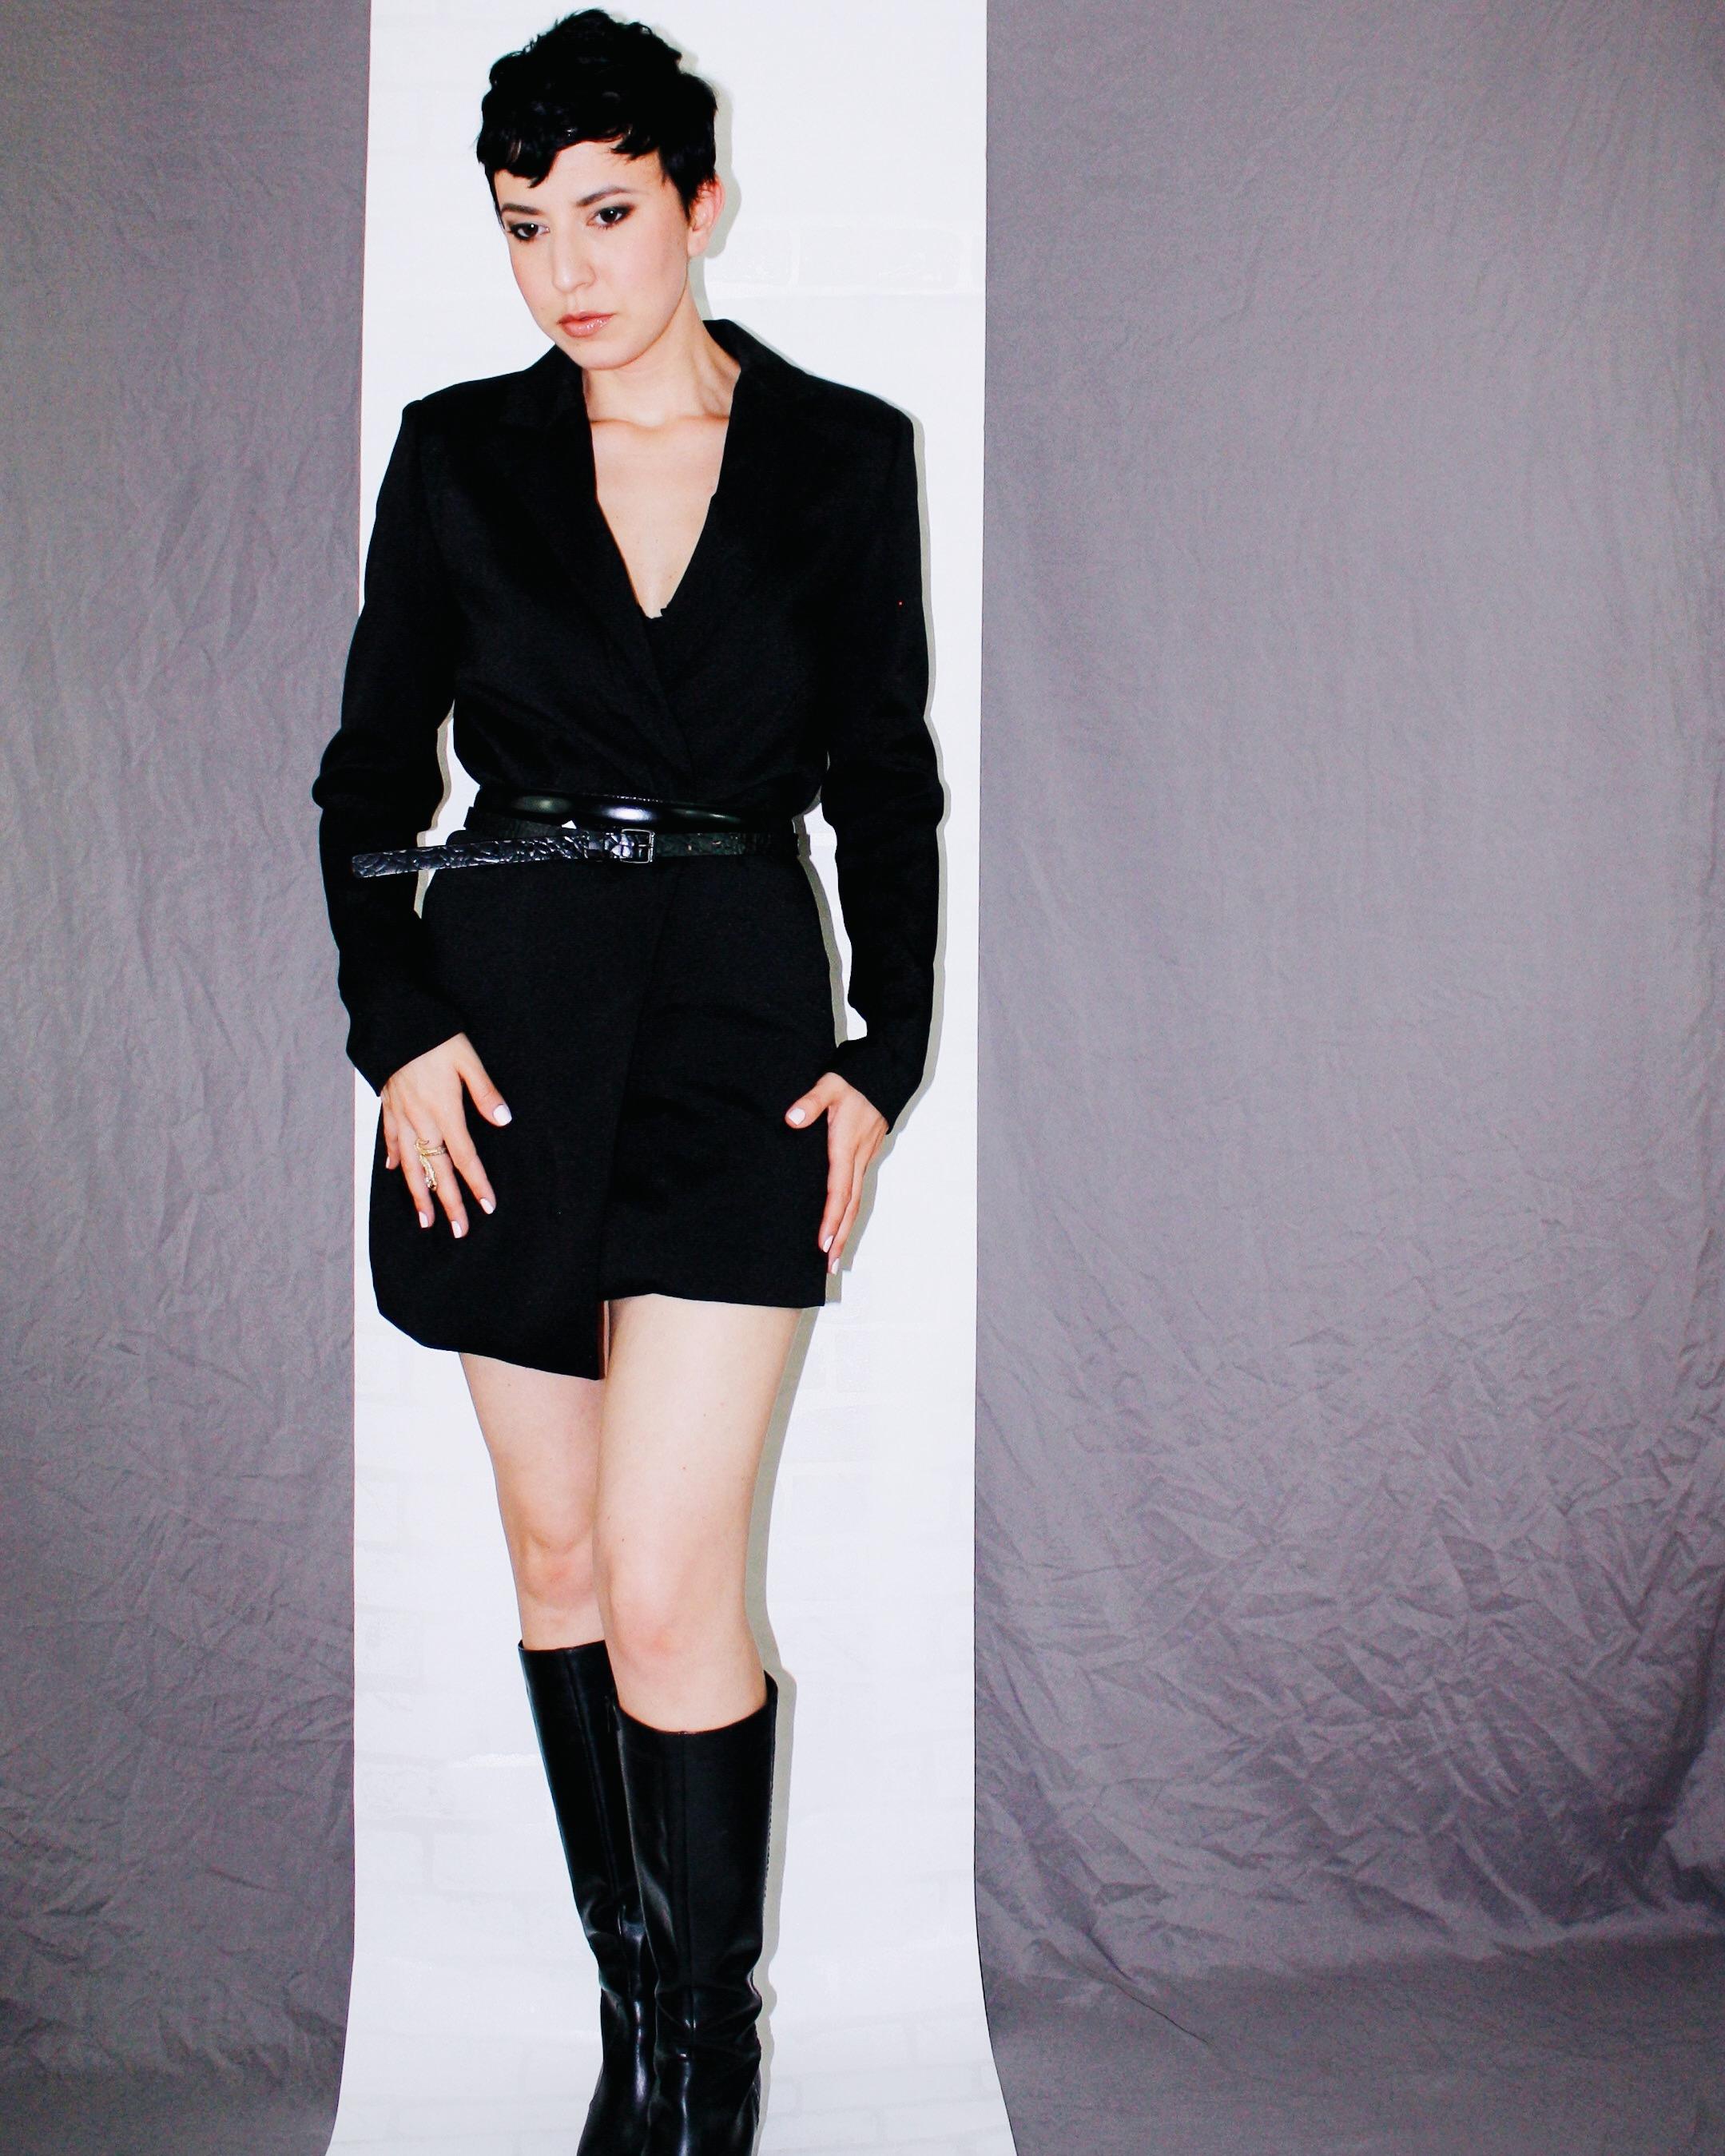 fall is here boots leather helmut lang blazer dress belts black 2